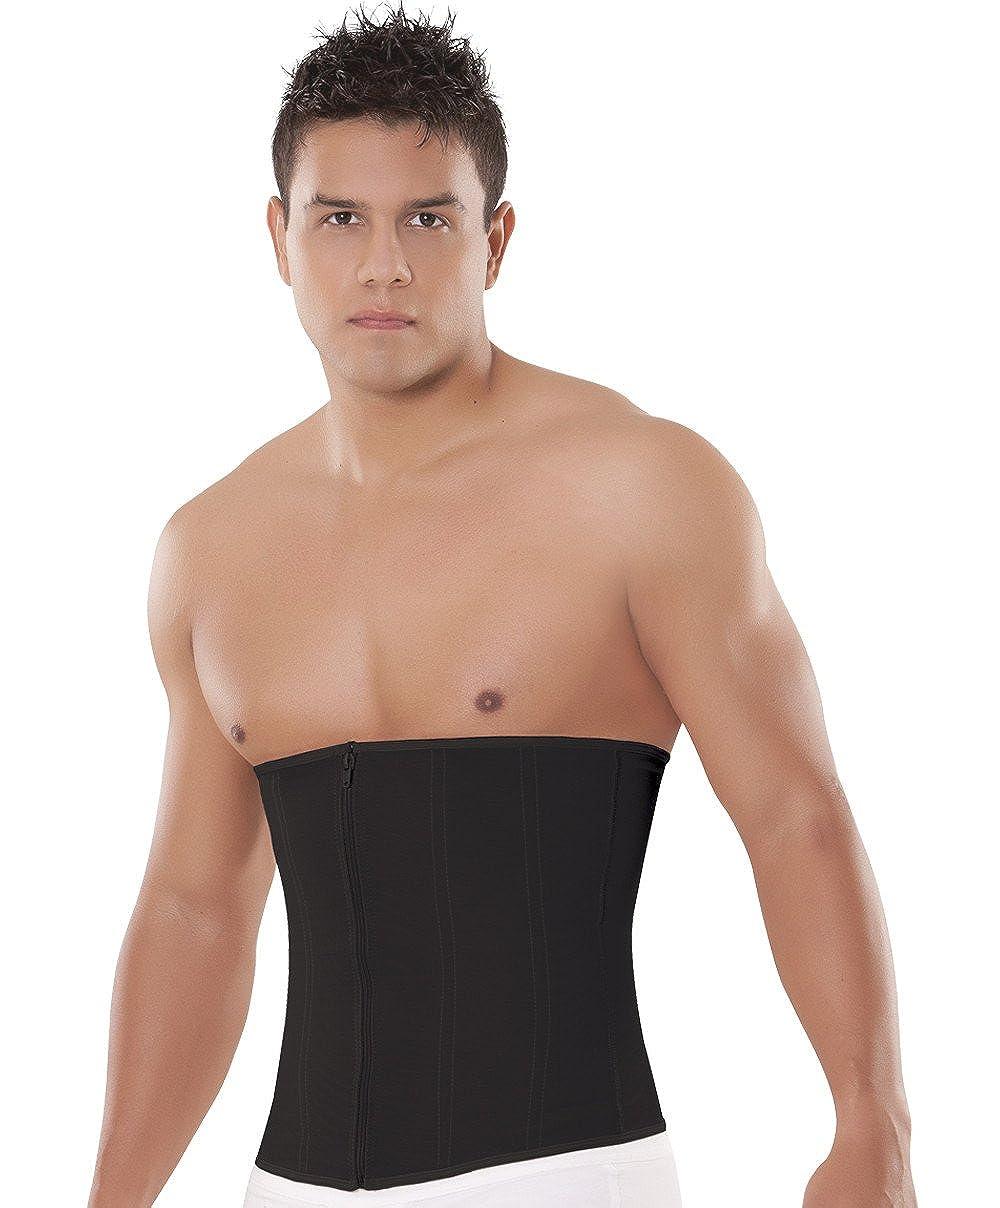 403fda33d10f6 Amazon.com  Equilibrium Firm Compression Girdle Waist Trainer for Men - Faja  Colombiana C4330  Clothing